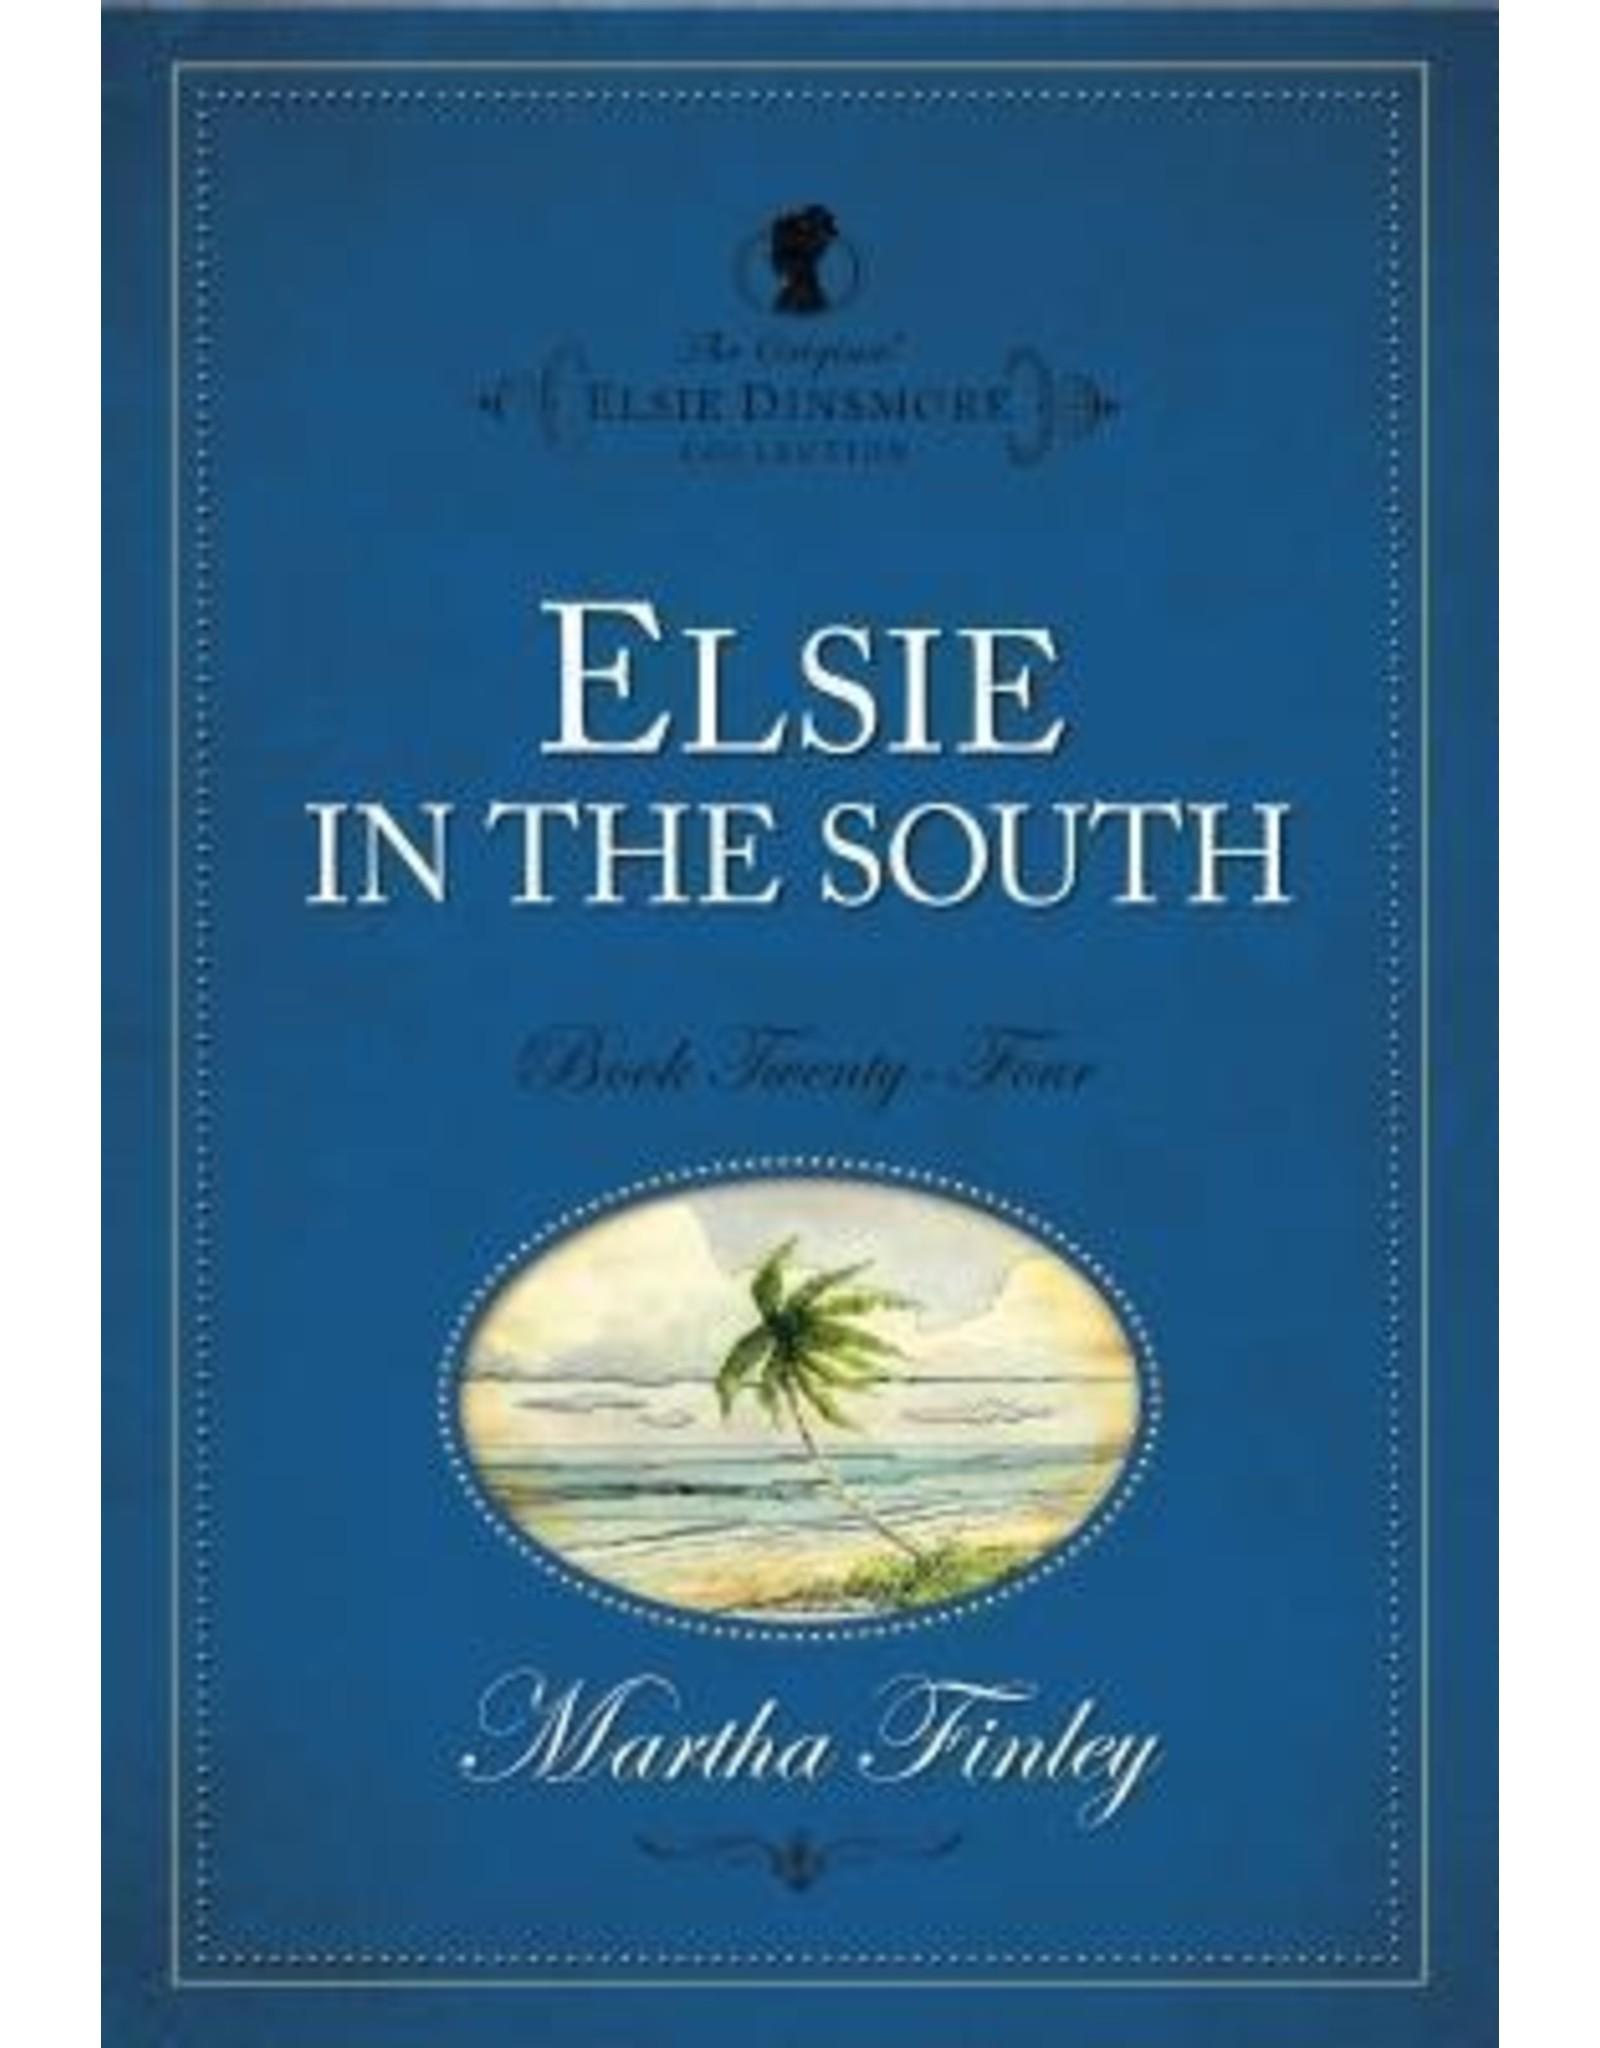 Martha Finley Elsie in the South - Book 24